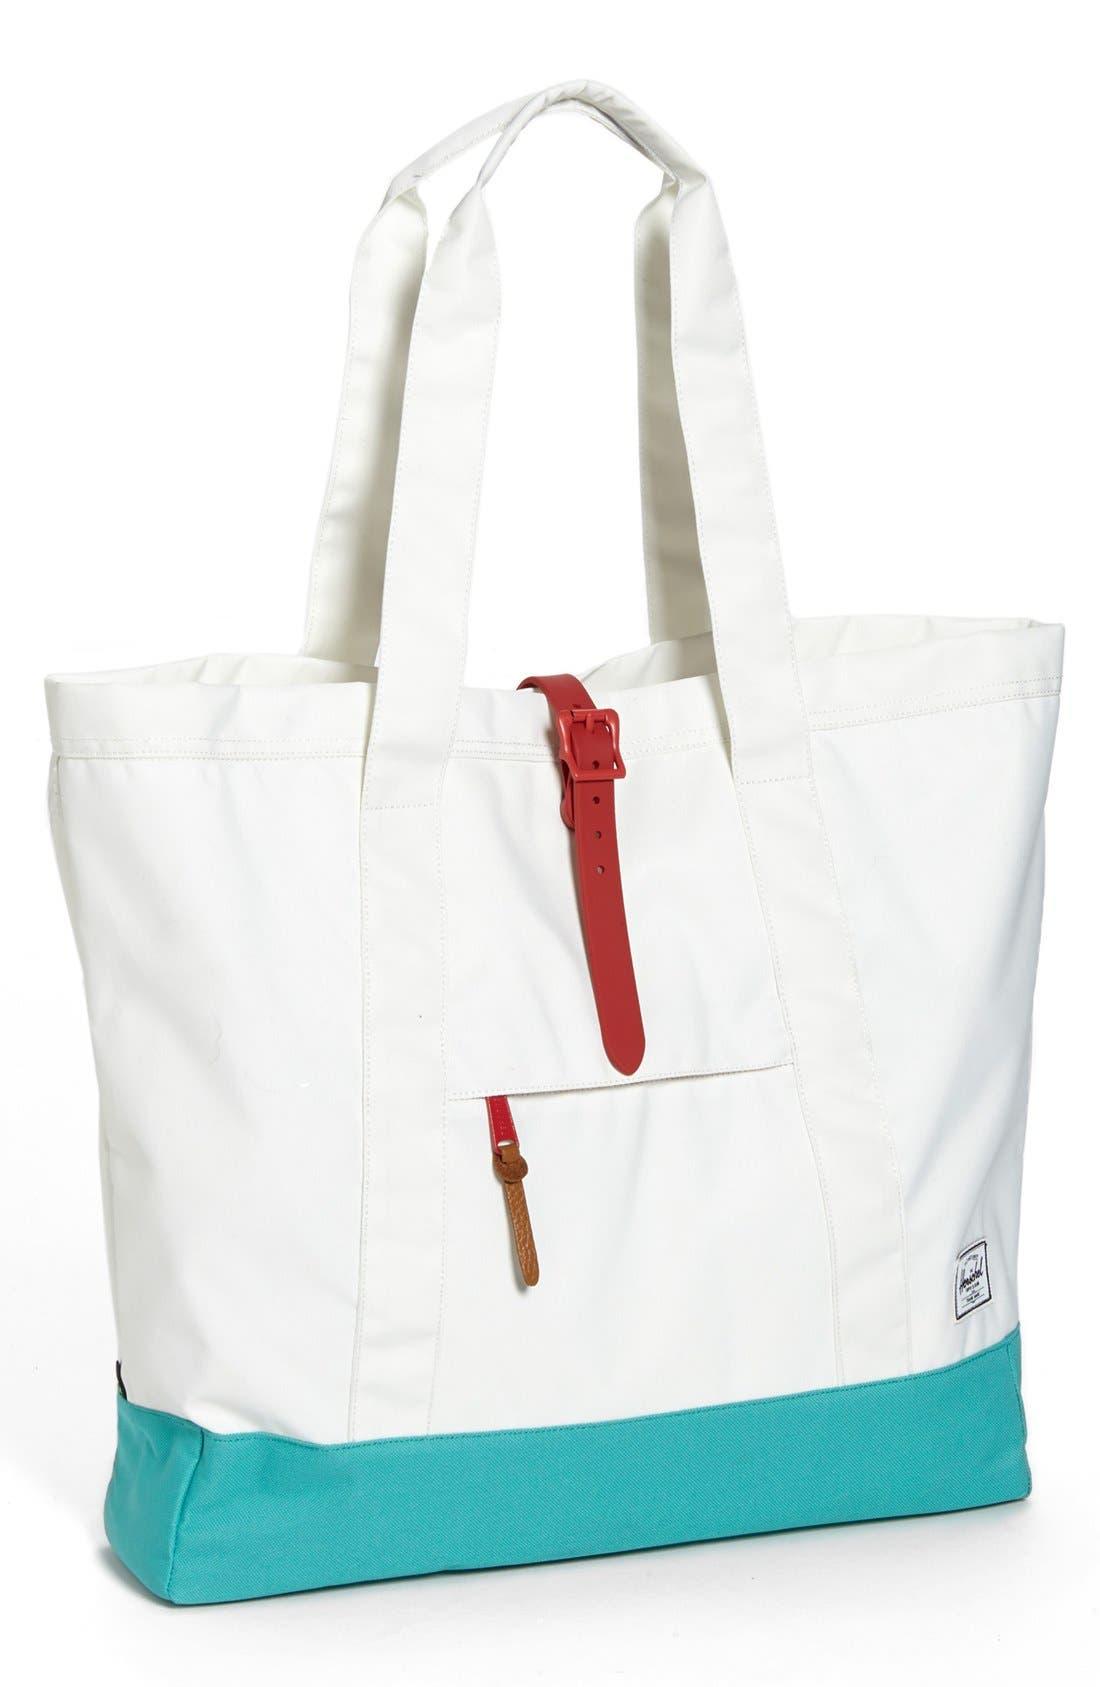 Main Image - Herschel Supply Co. 'Market - Studio Collection' Large Tote Bag